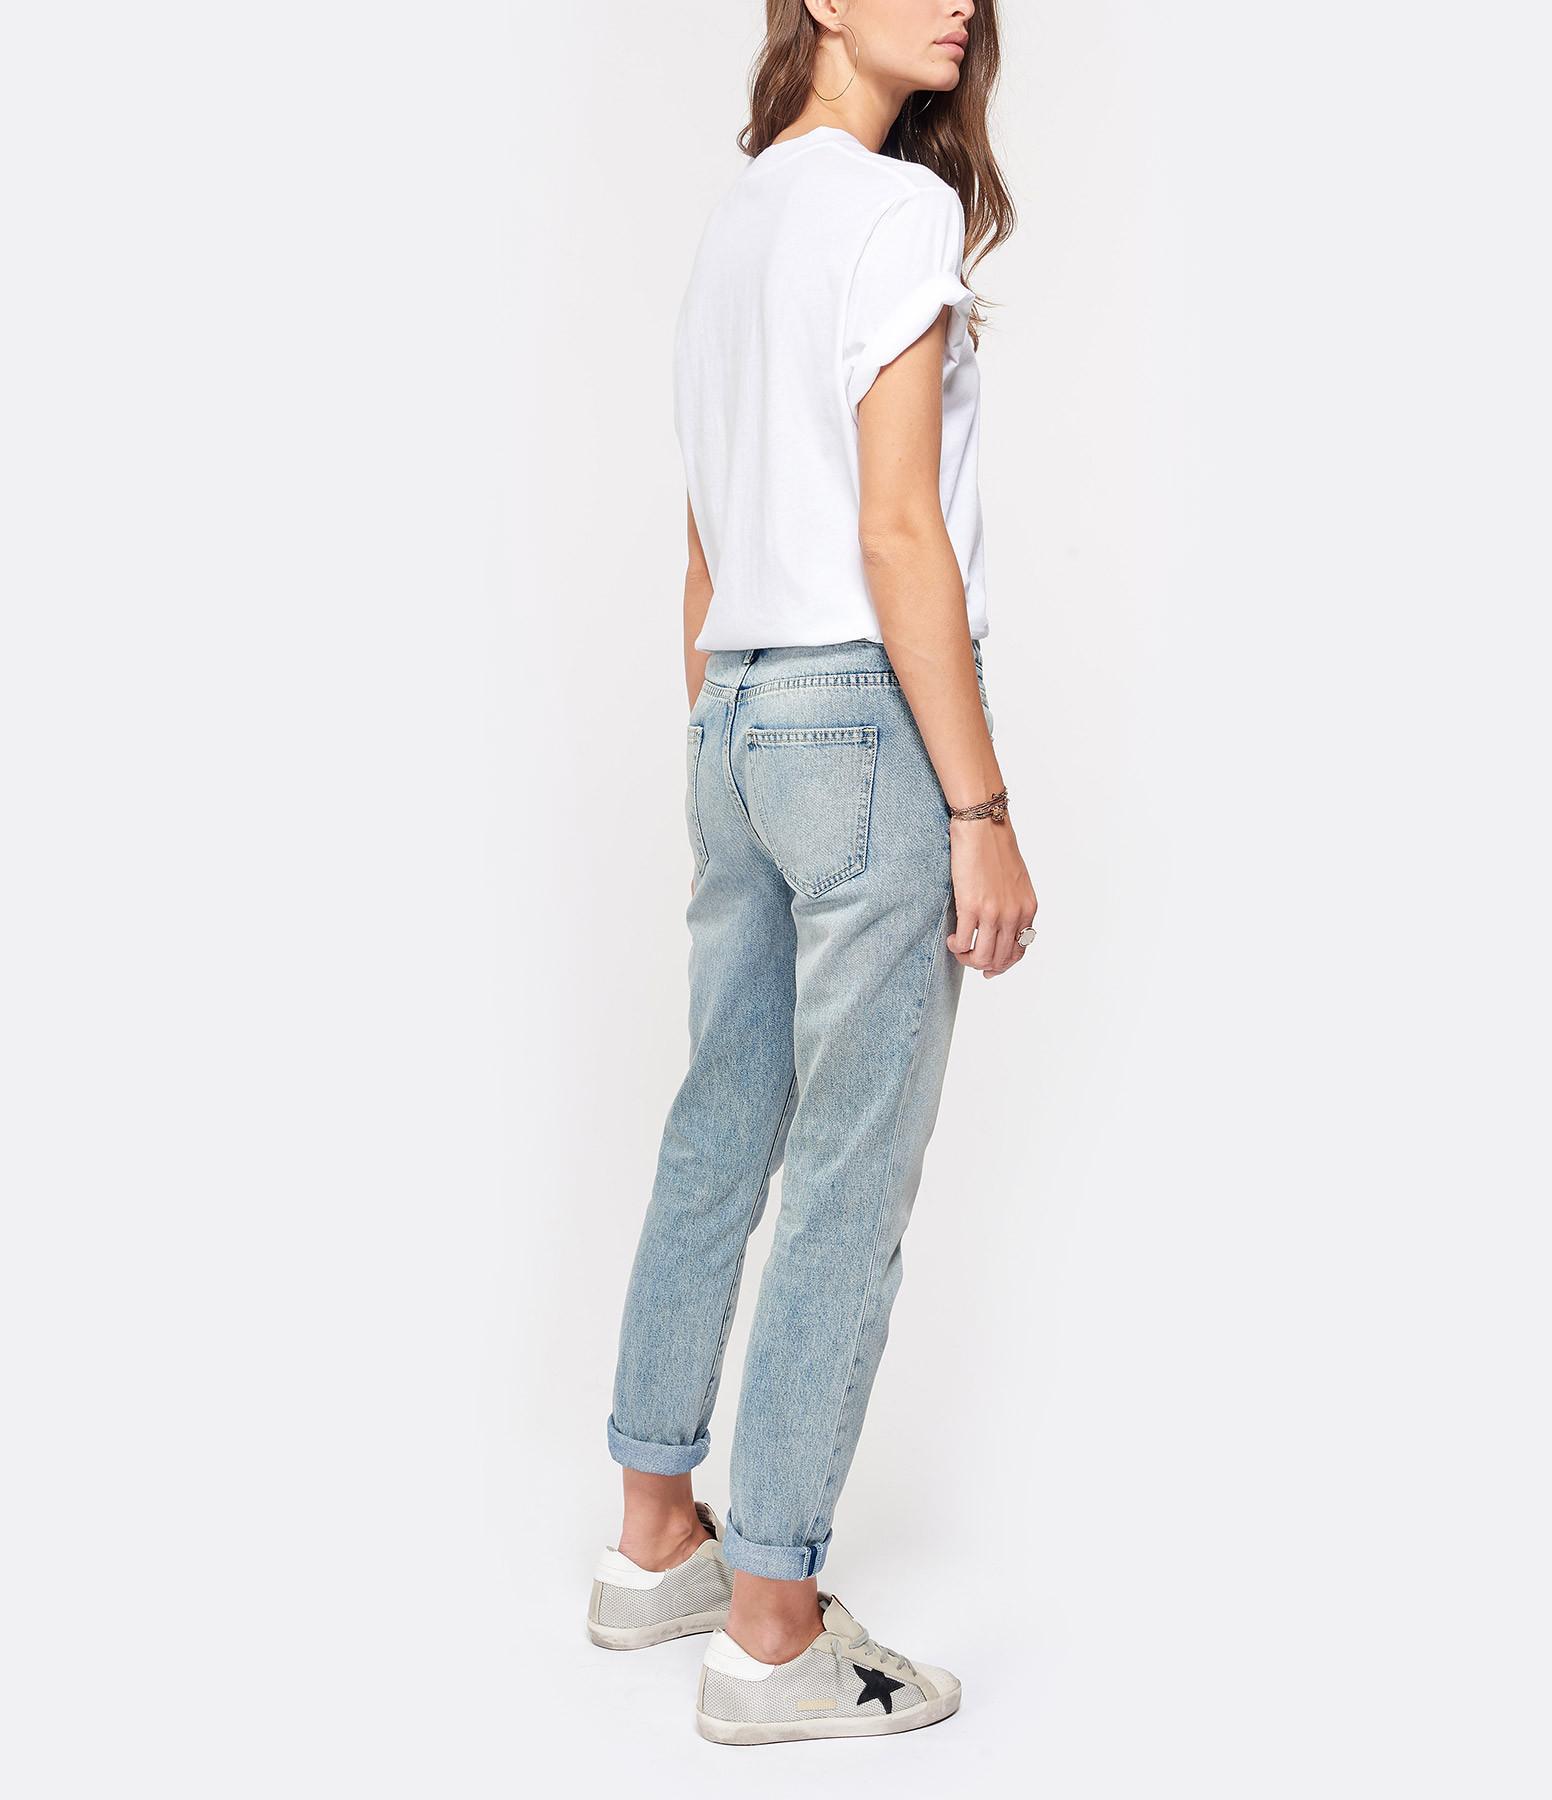 IRO - Tee-shirt Balko Coton Blanc